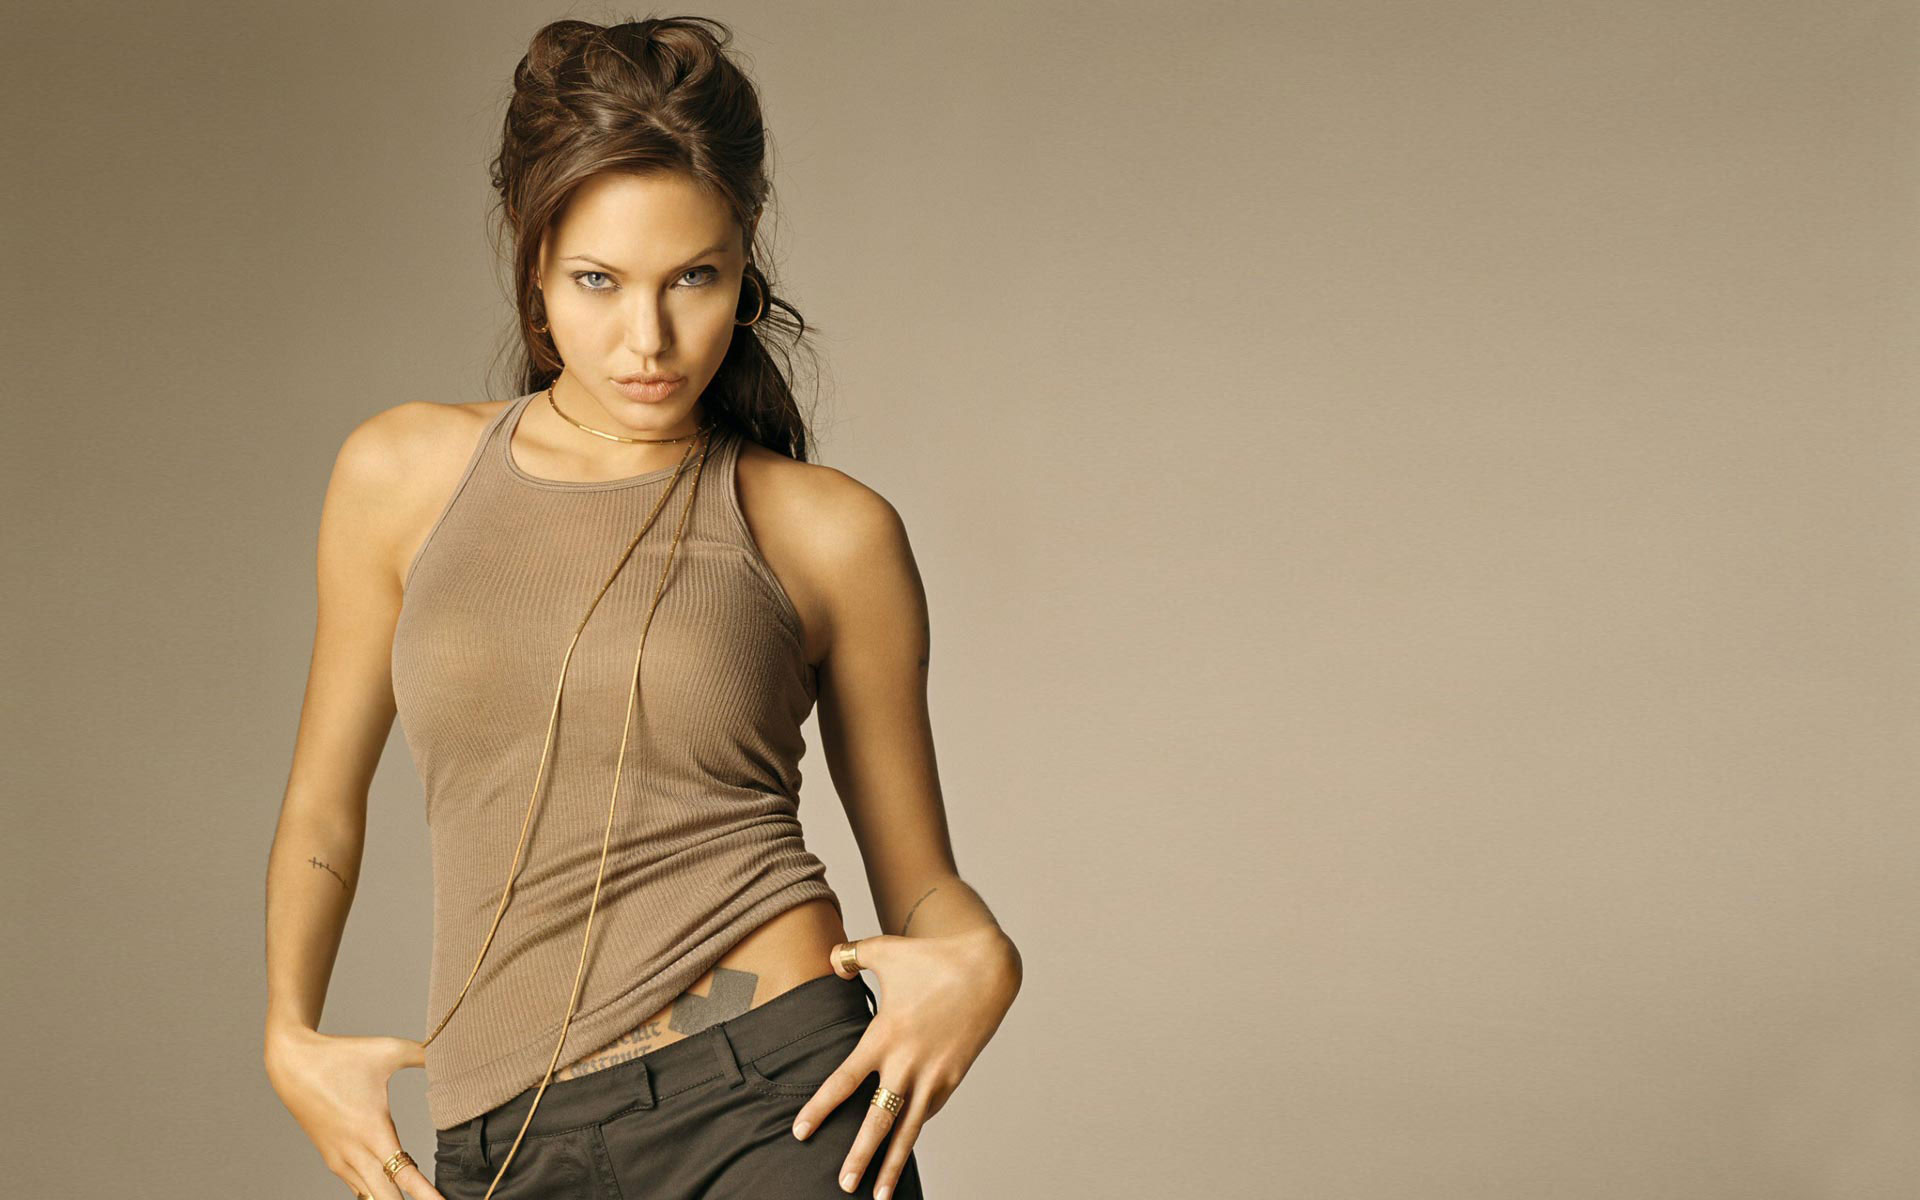 Angelina Jolie Widescreen wallpaper